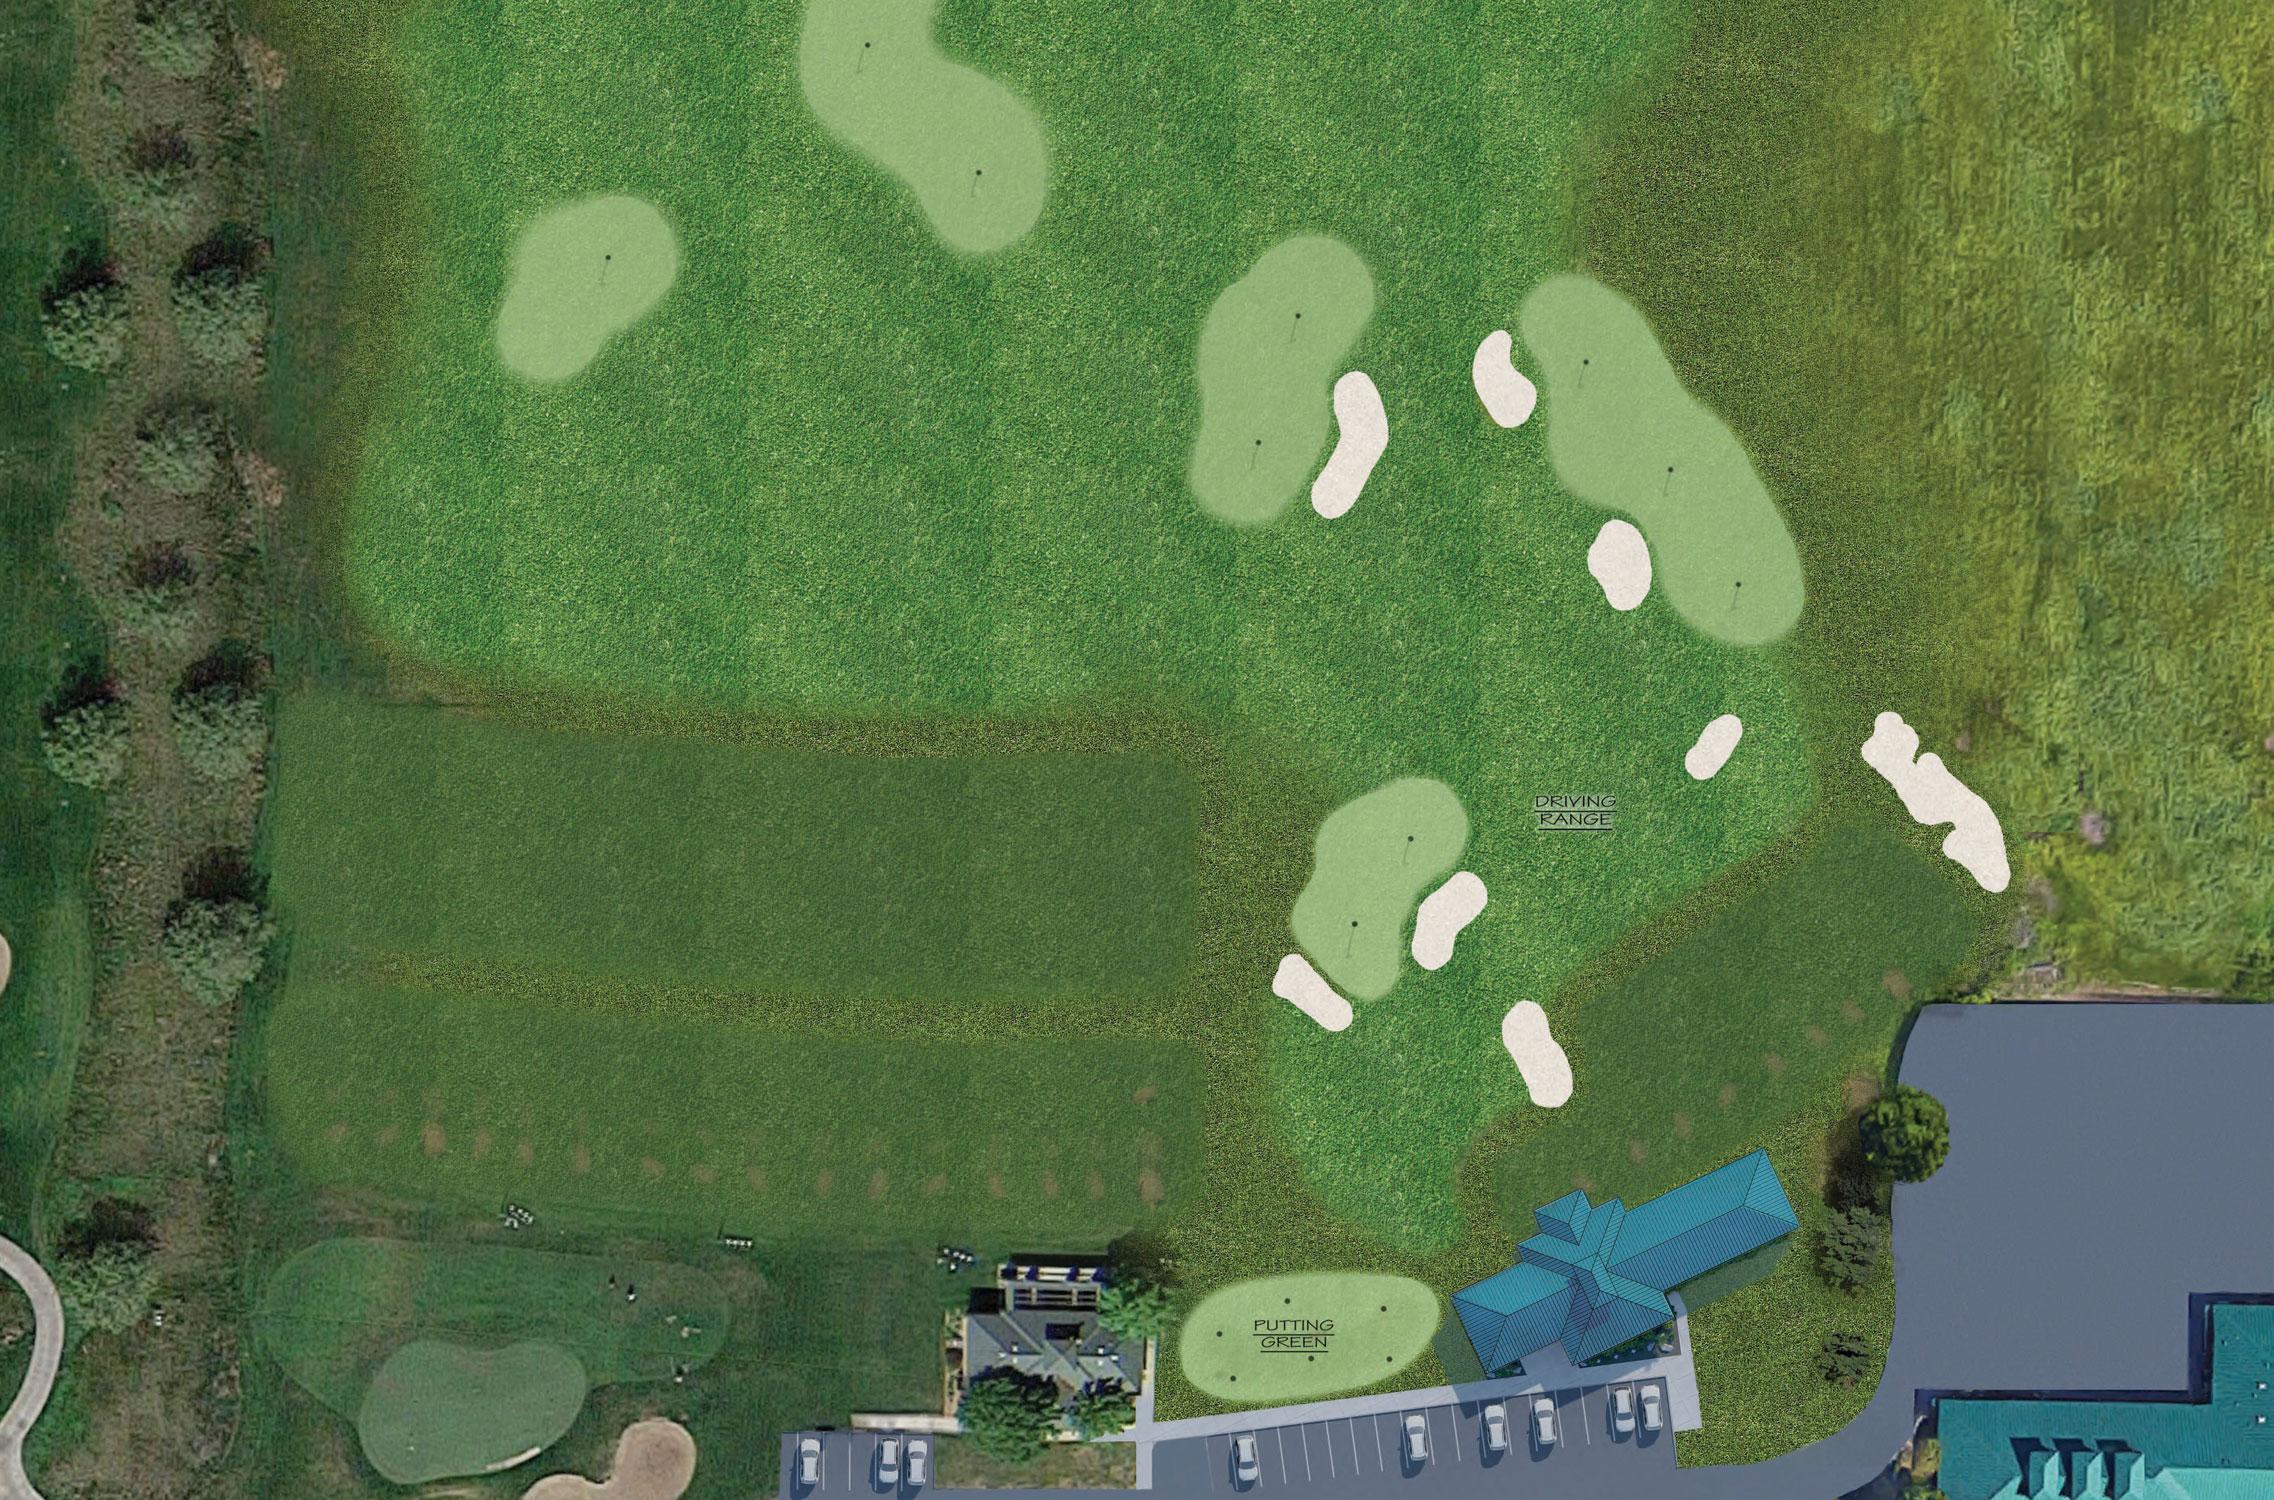 Golf Training Facility Course